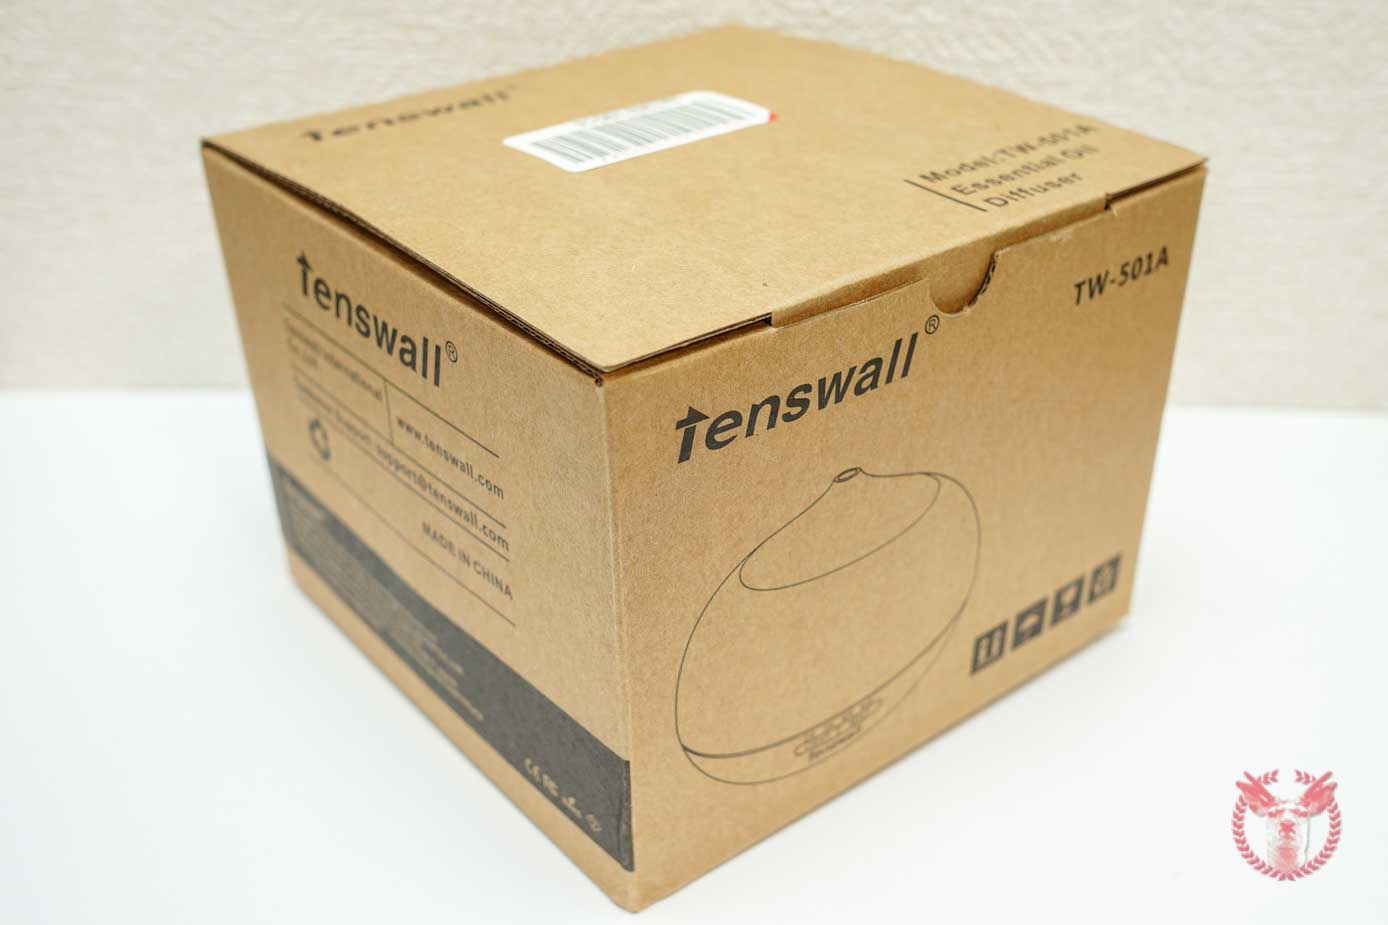 Tenswall aroma diffuser 1